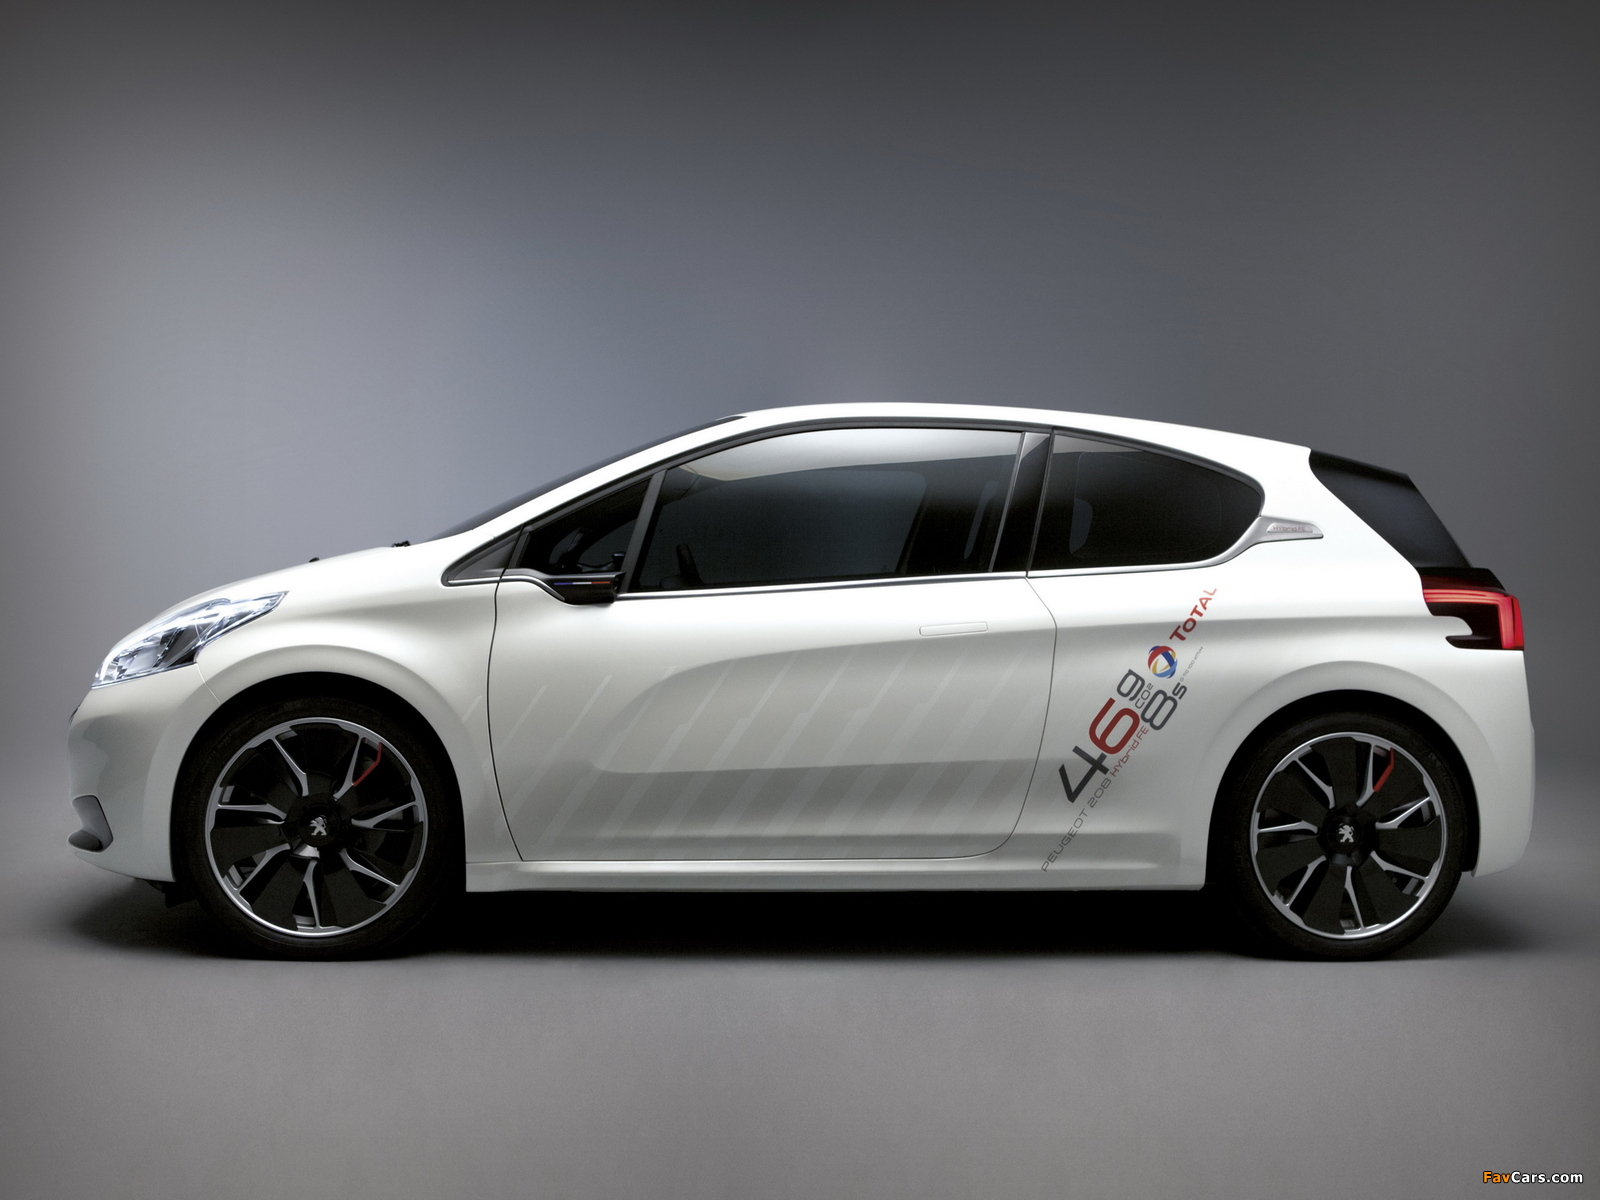 Peugeot 208 HYbrid FE Concept 2013 pictures (1600 x 1200)